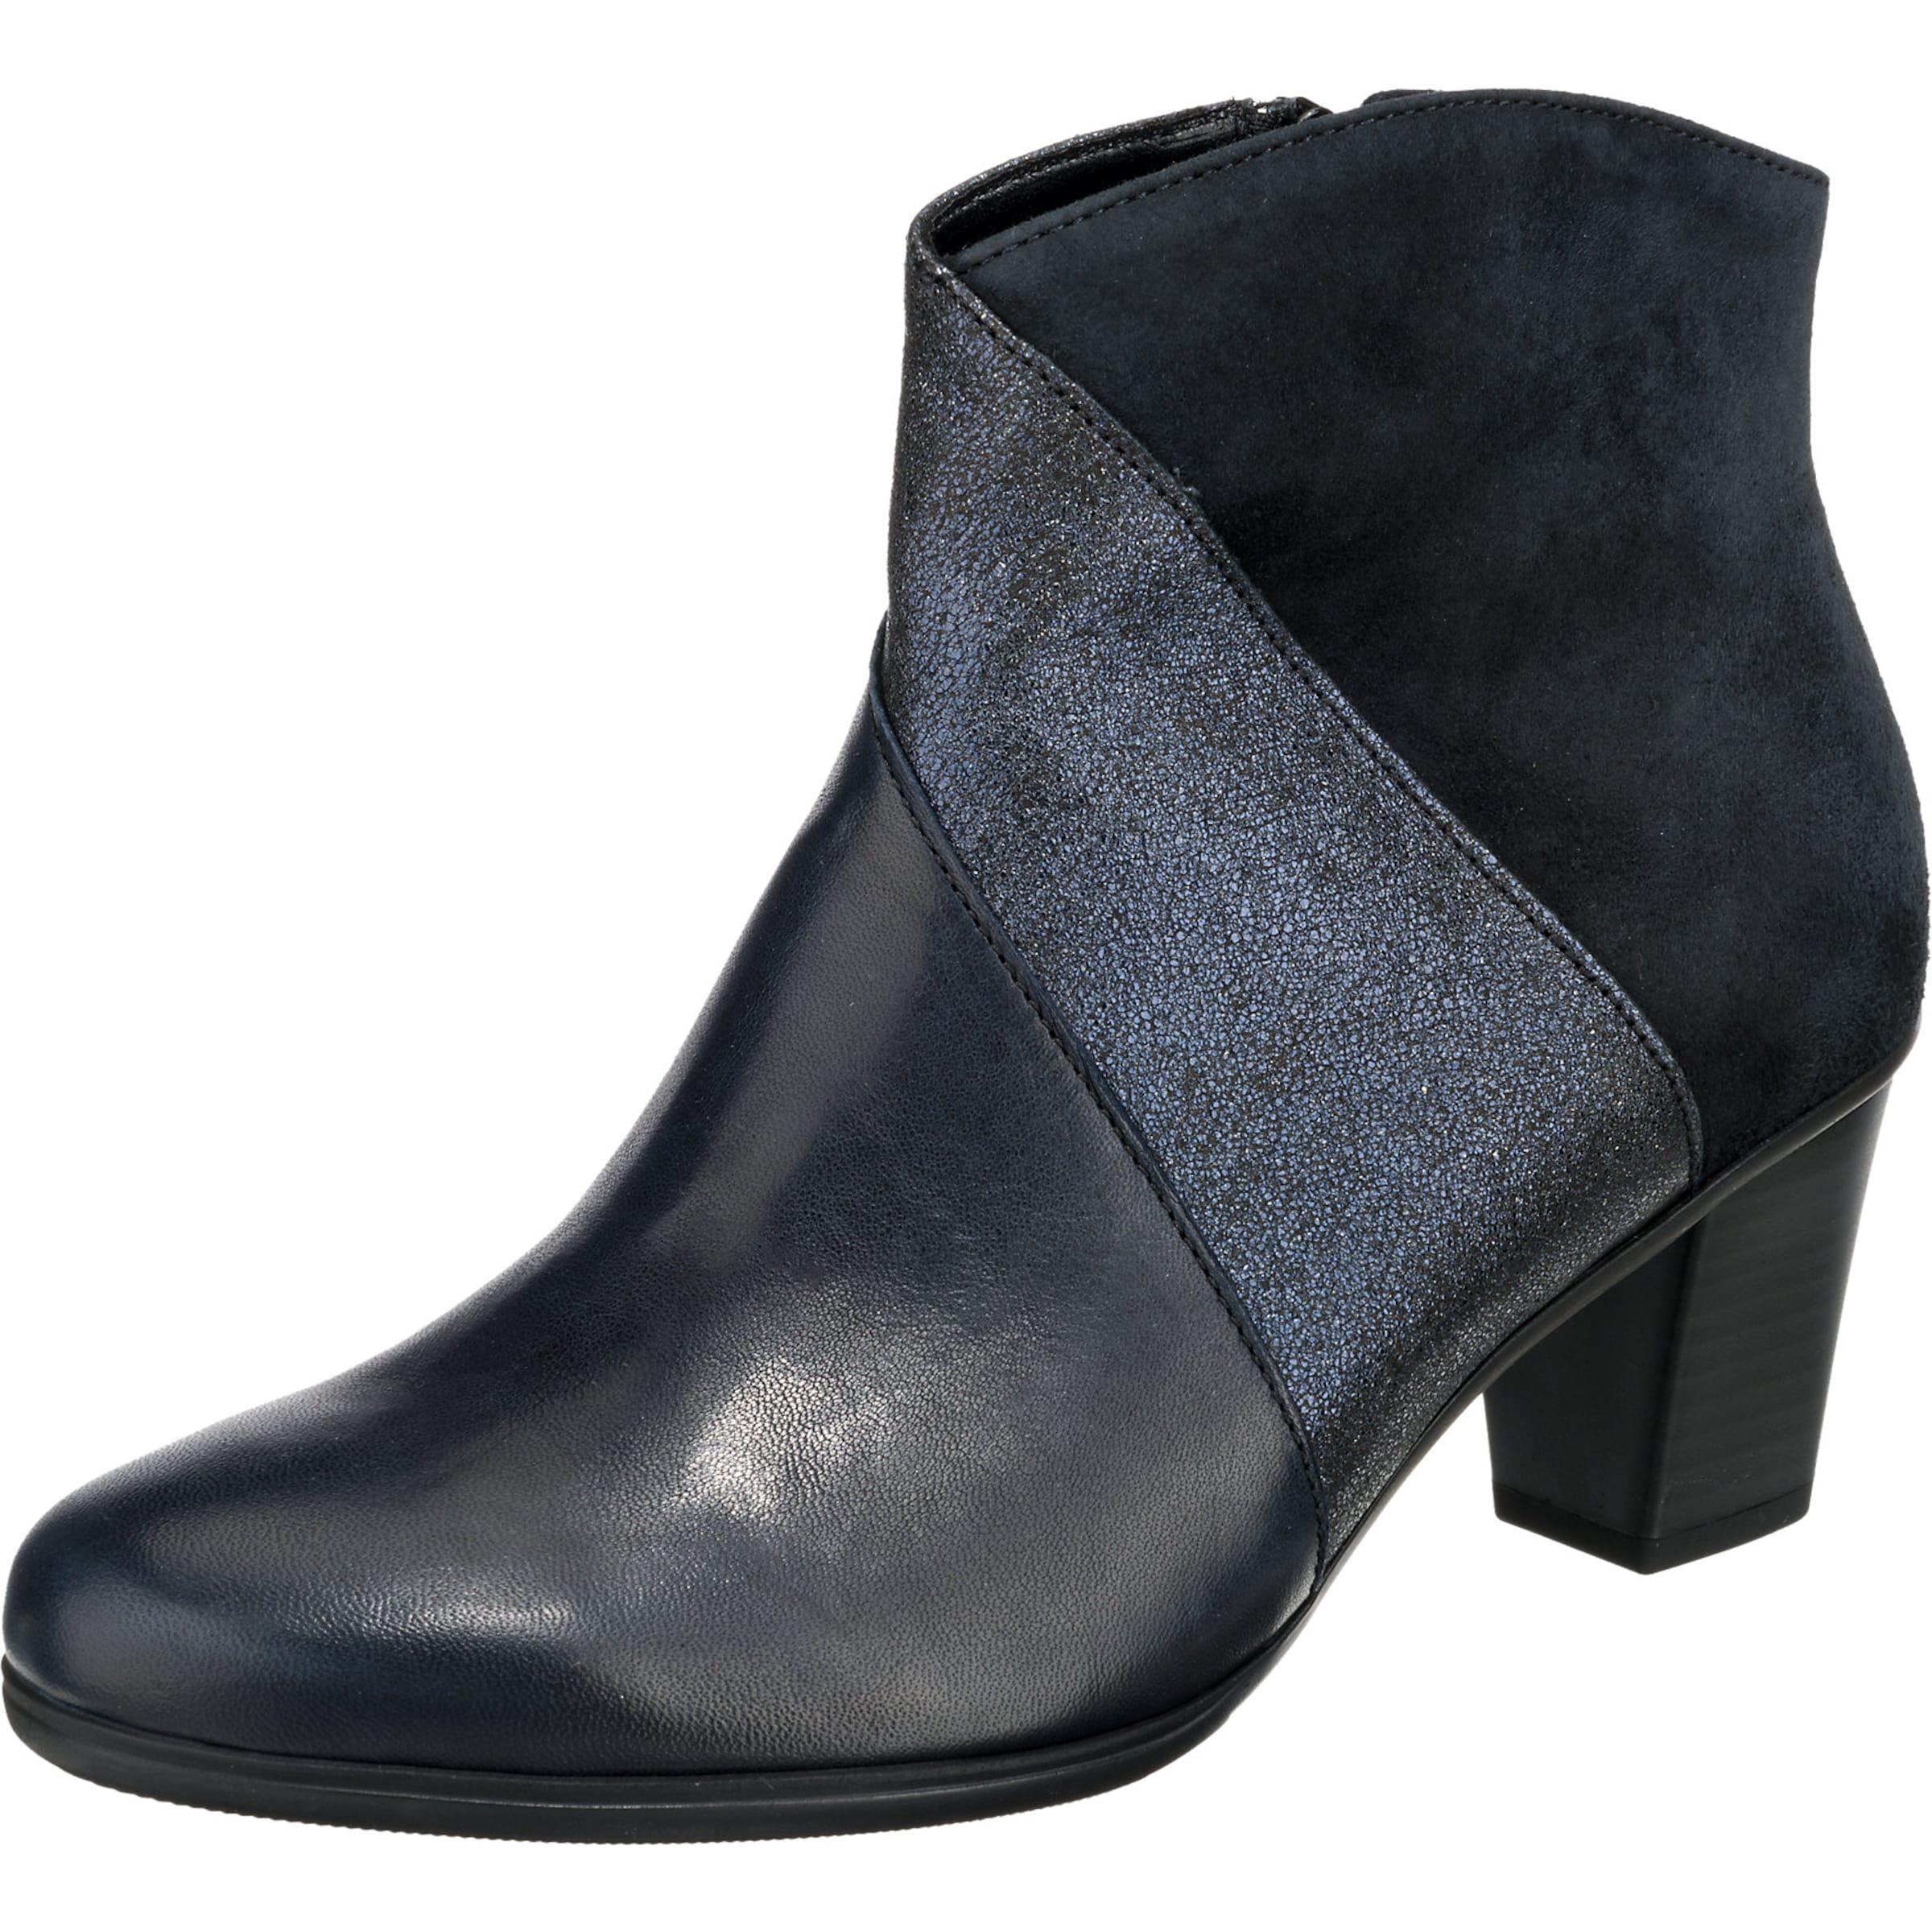 Boots Taubenblau Ankle Gabor KobaltblauNachtblau In rQsdtCxBh